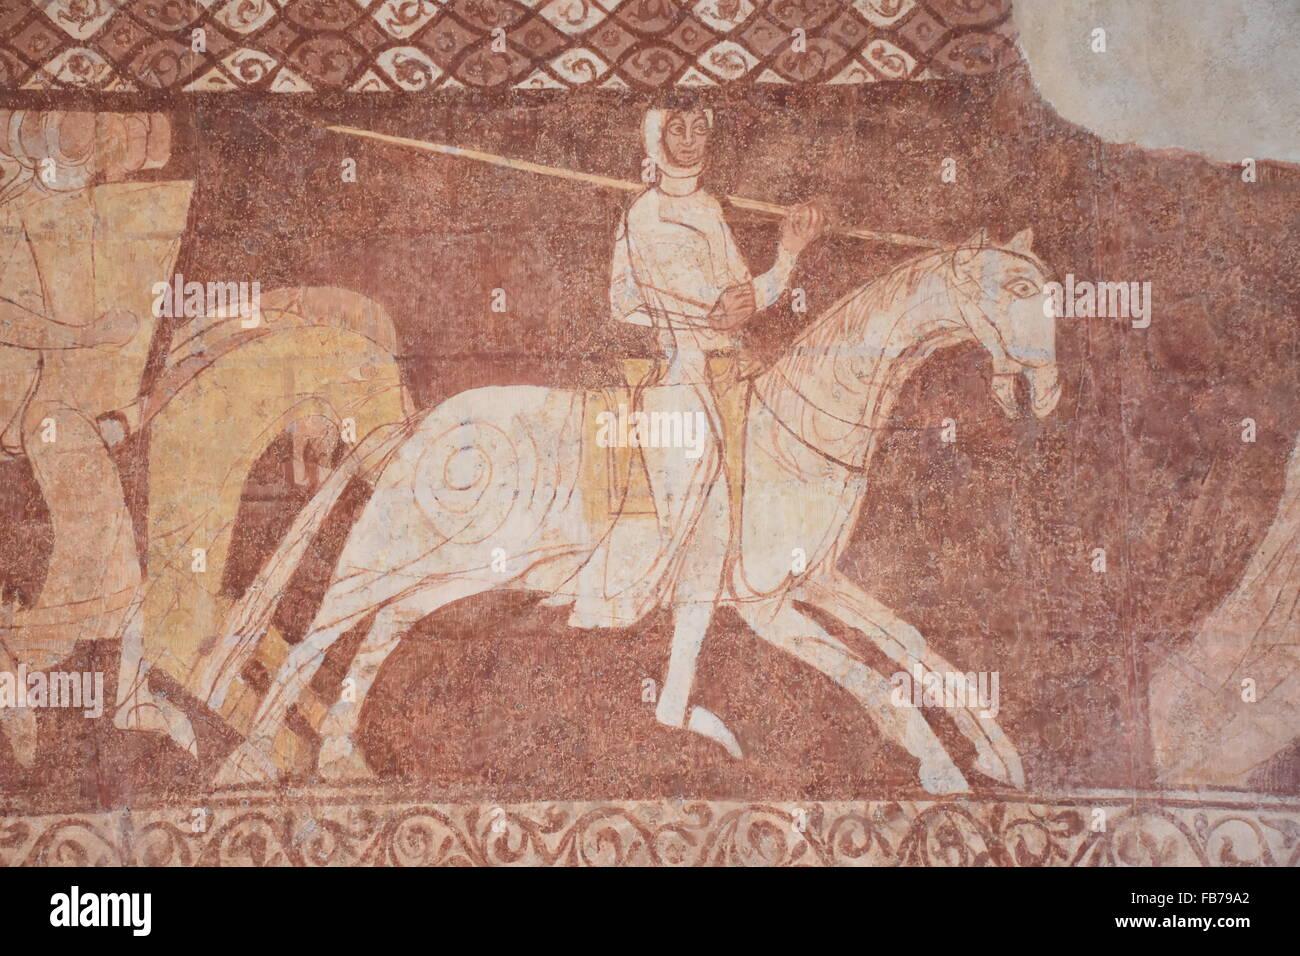 Mural Cressac Templar chapel France - Stock Image